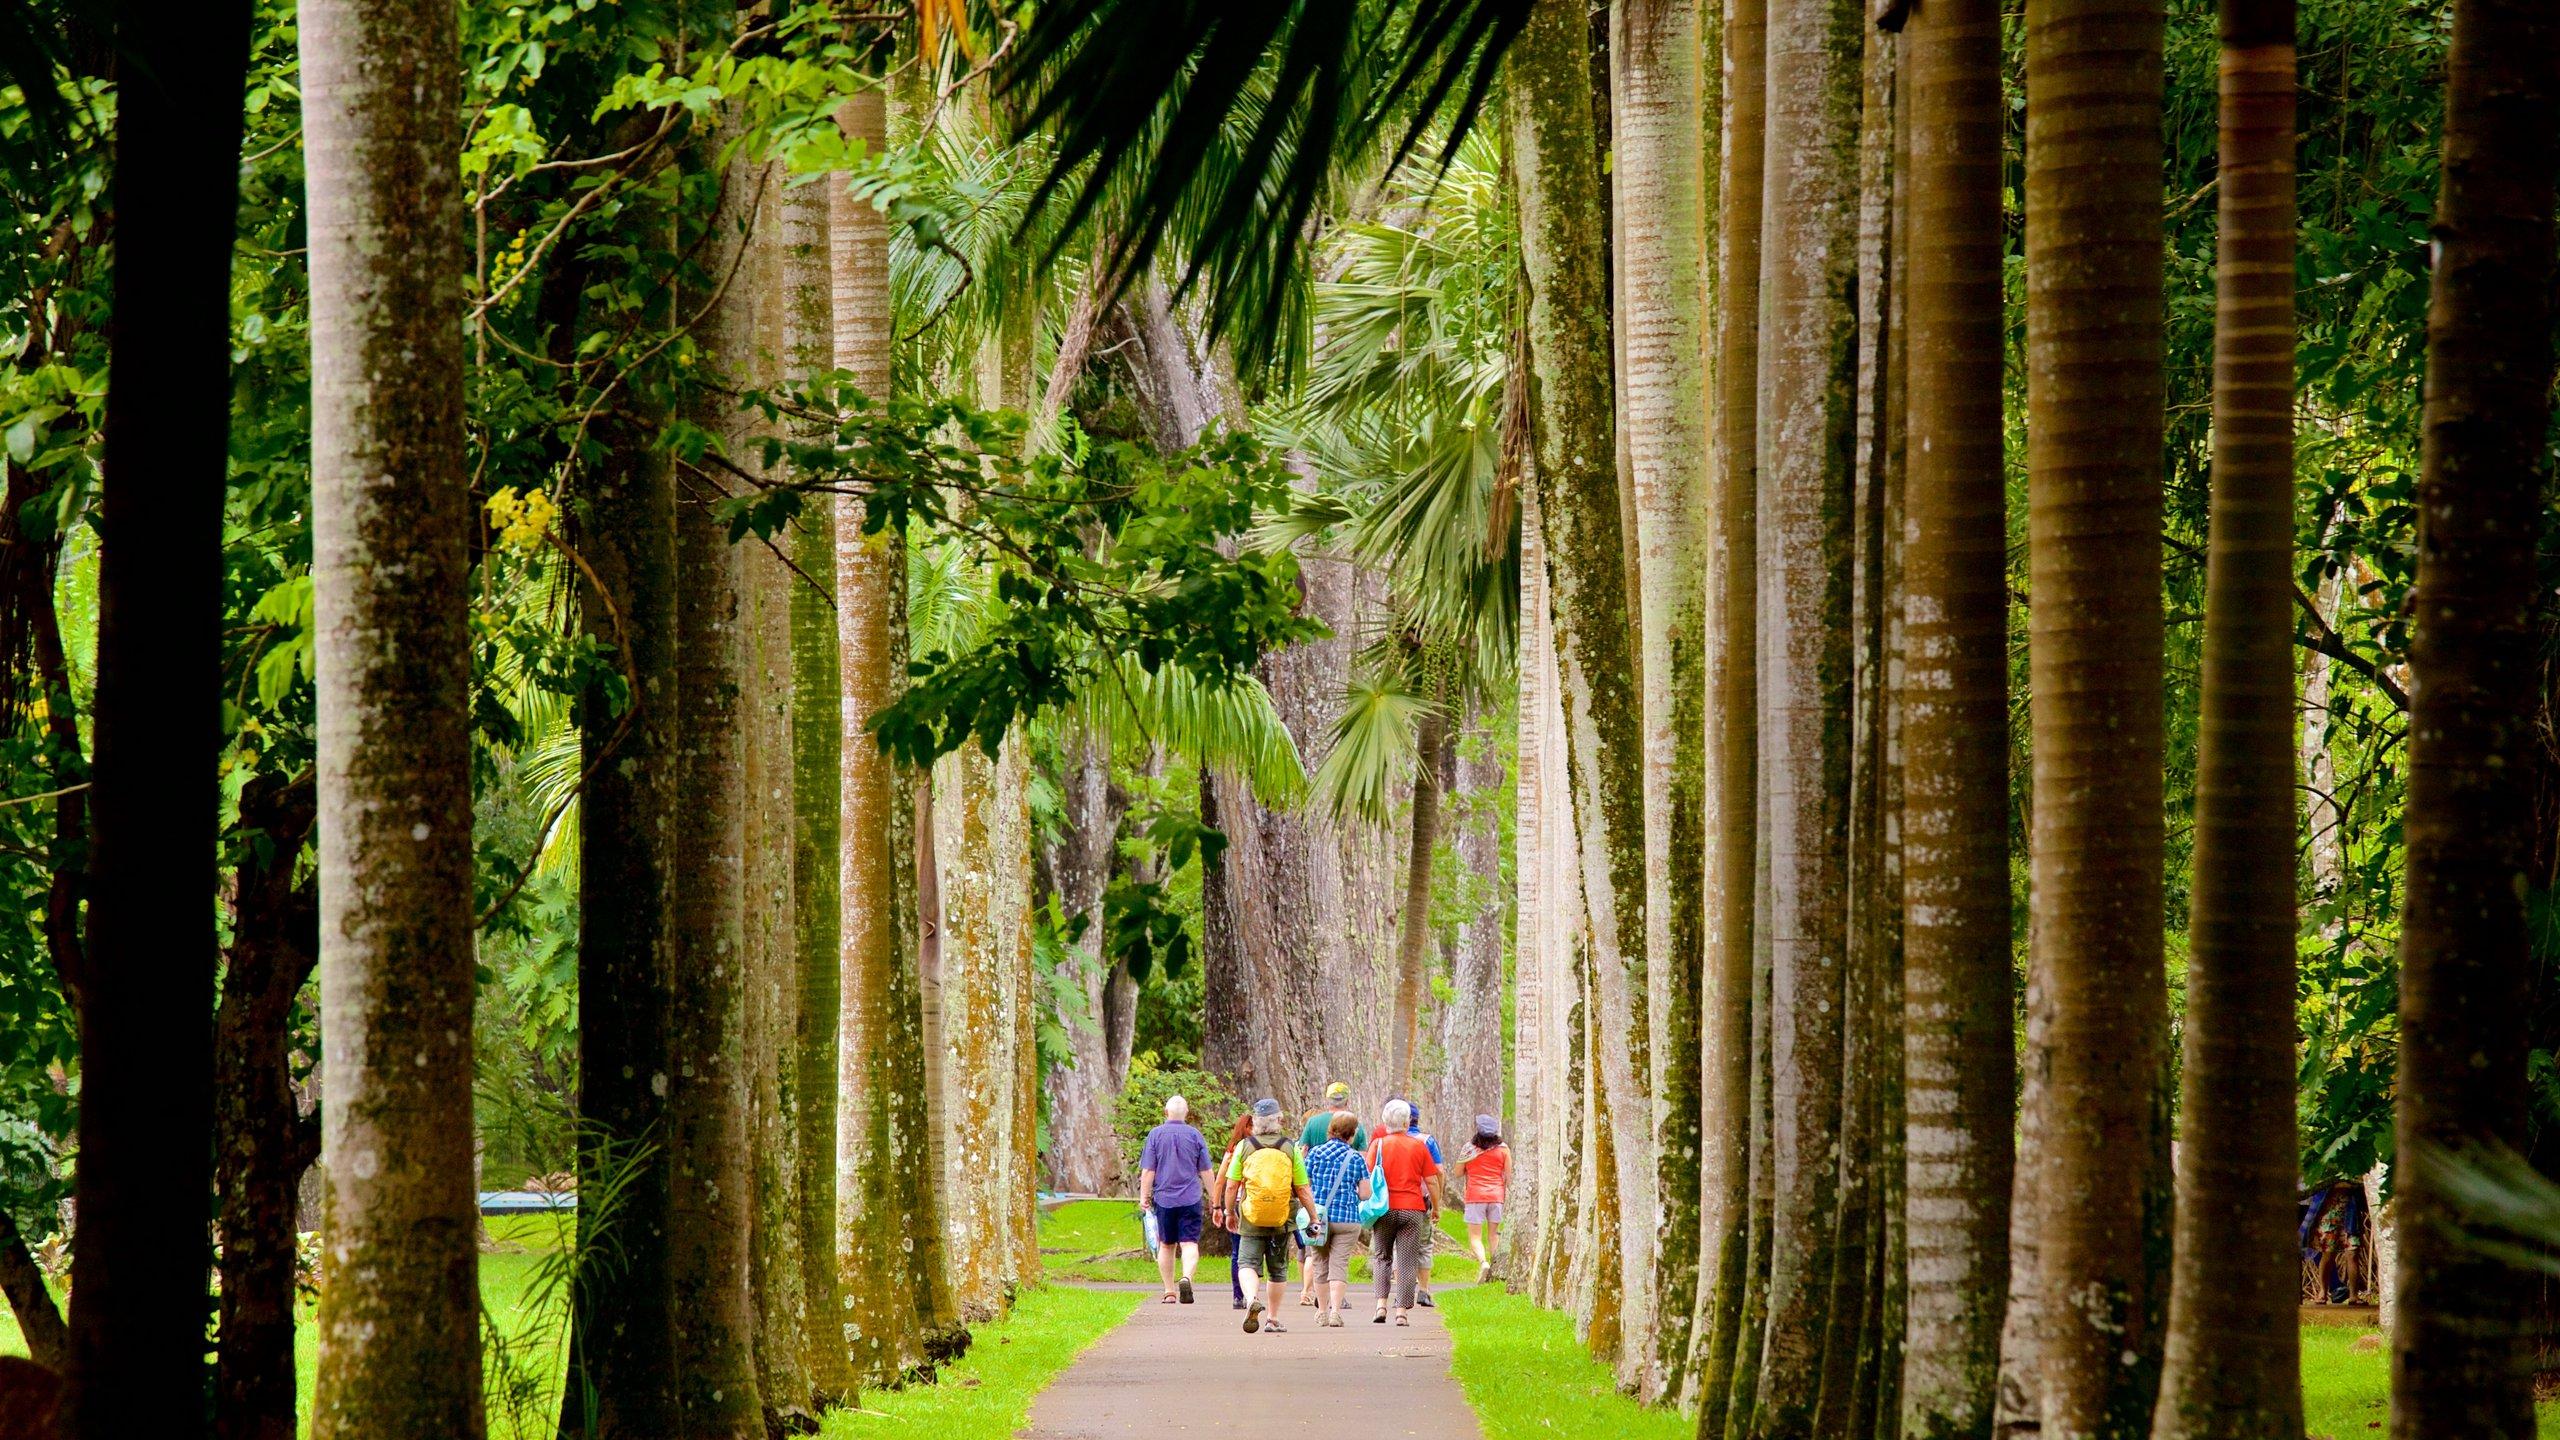 Pamplemousses, Mauritius